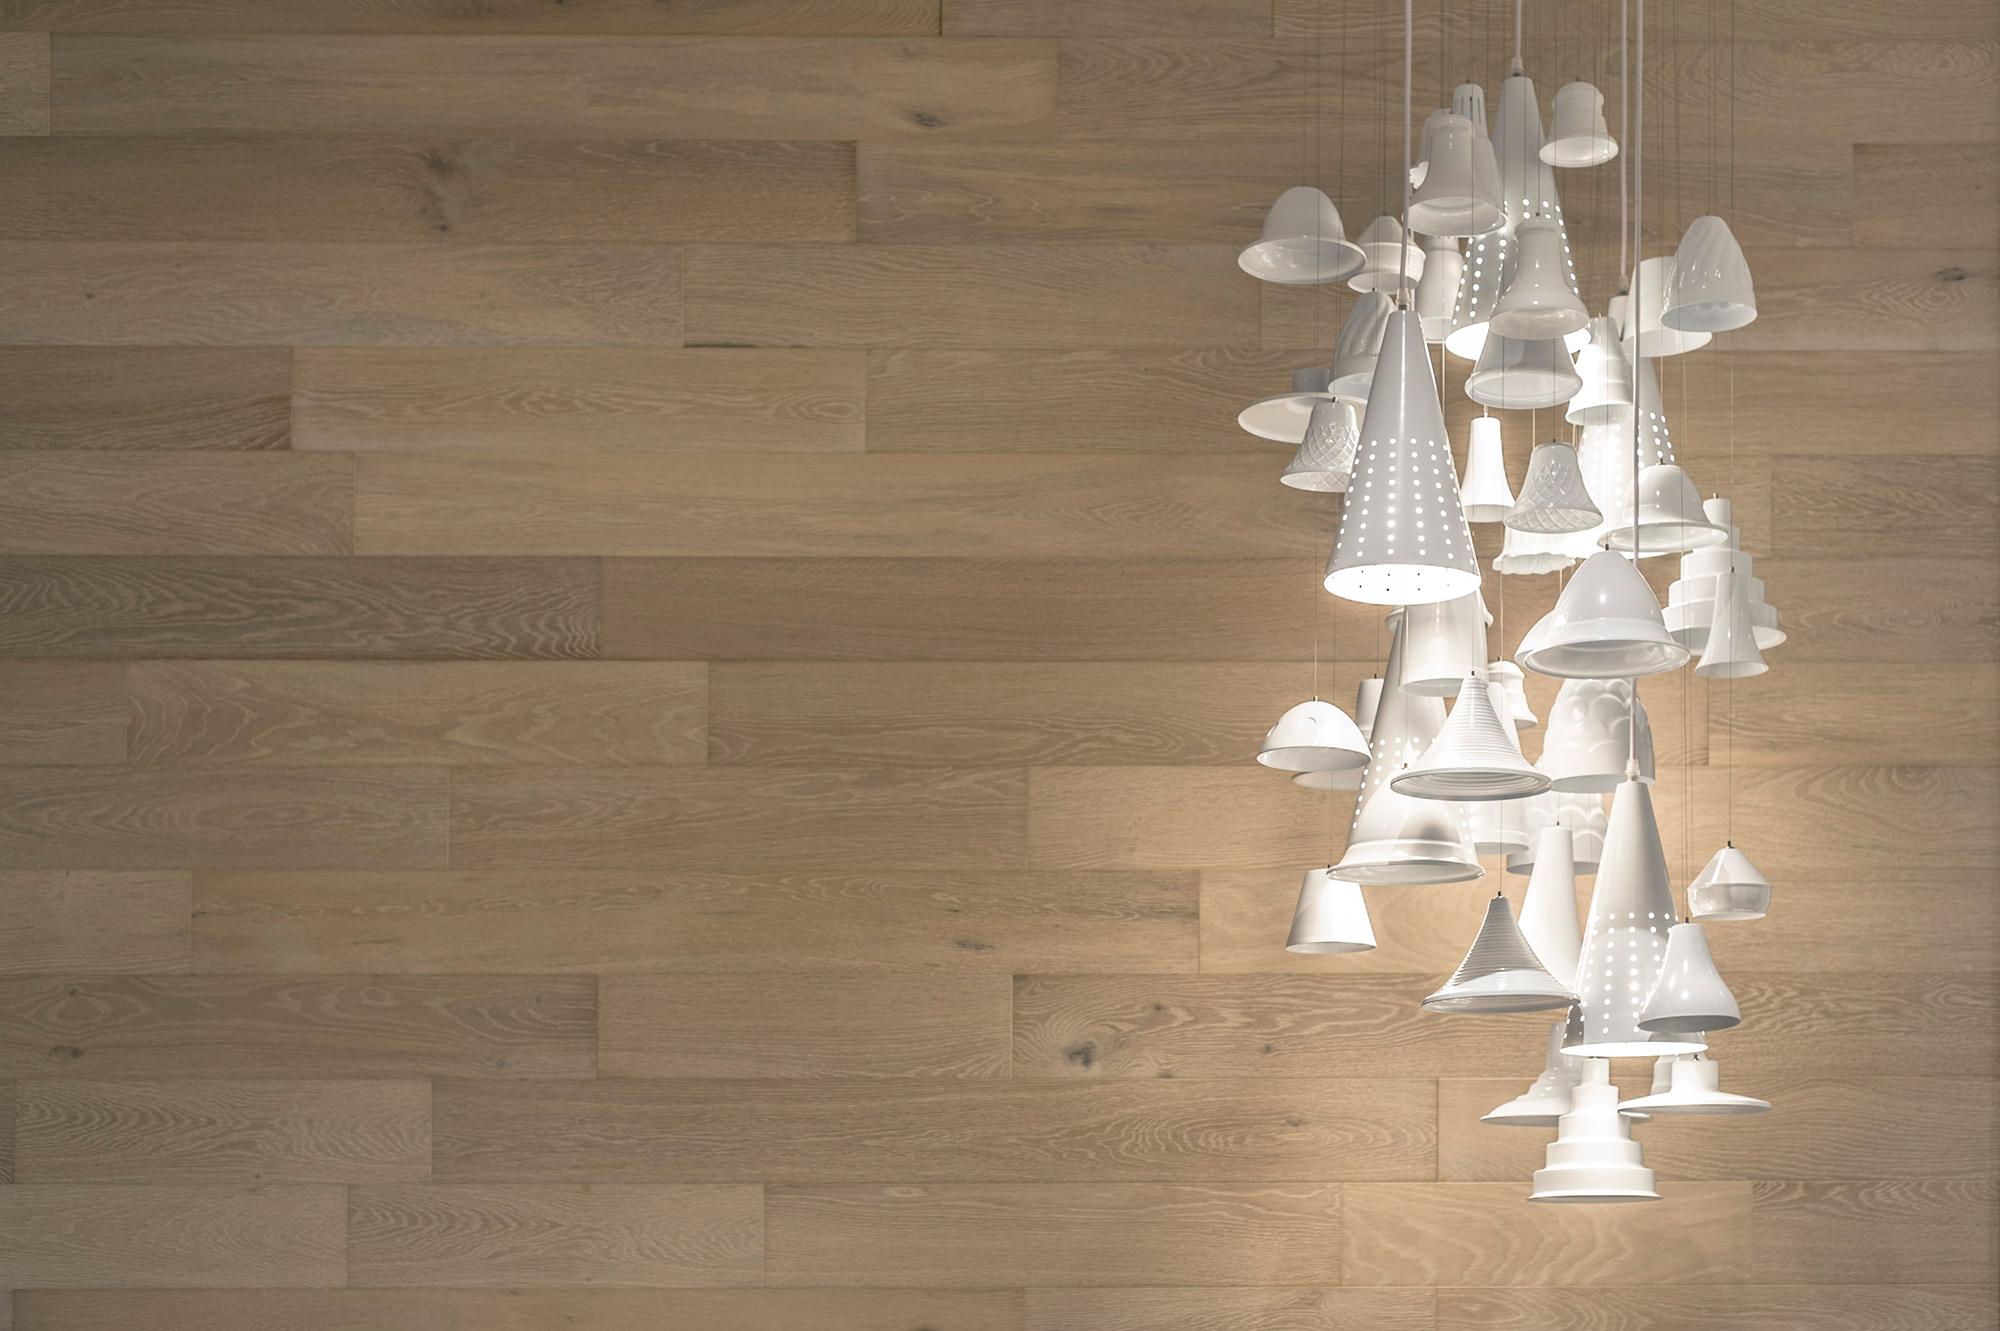 interior-design-legal-office-lighting.jpg